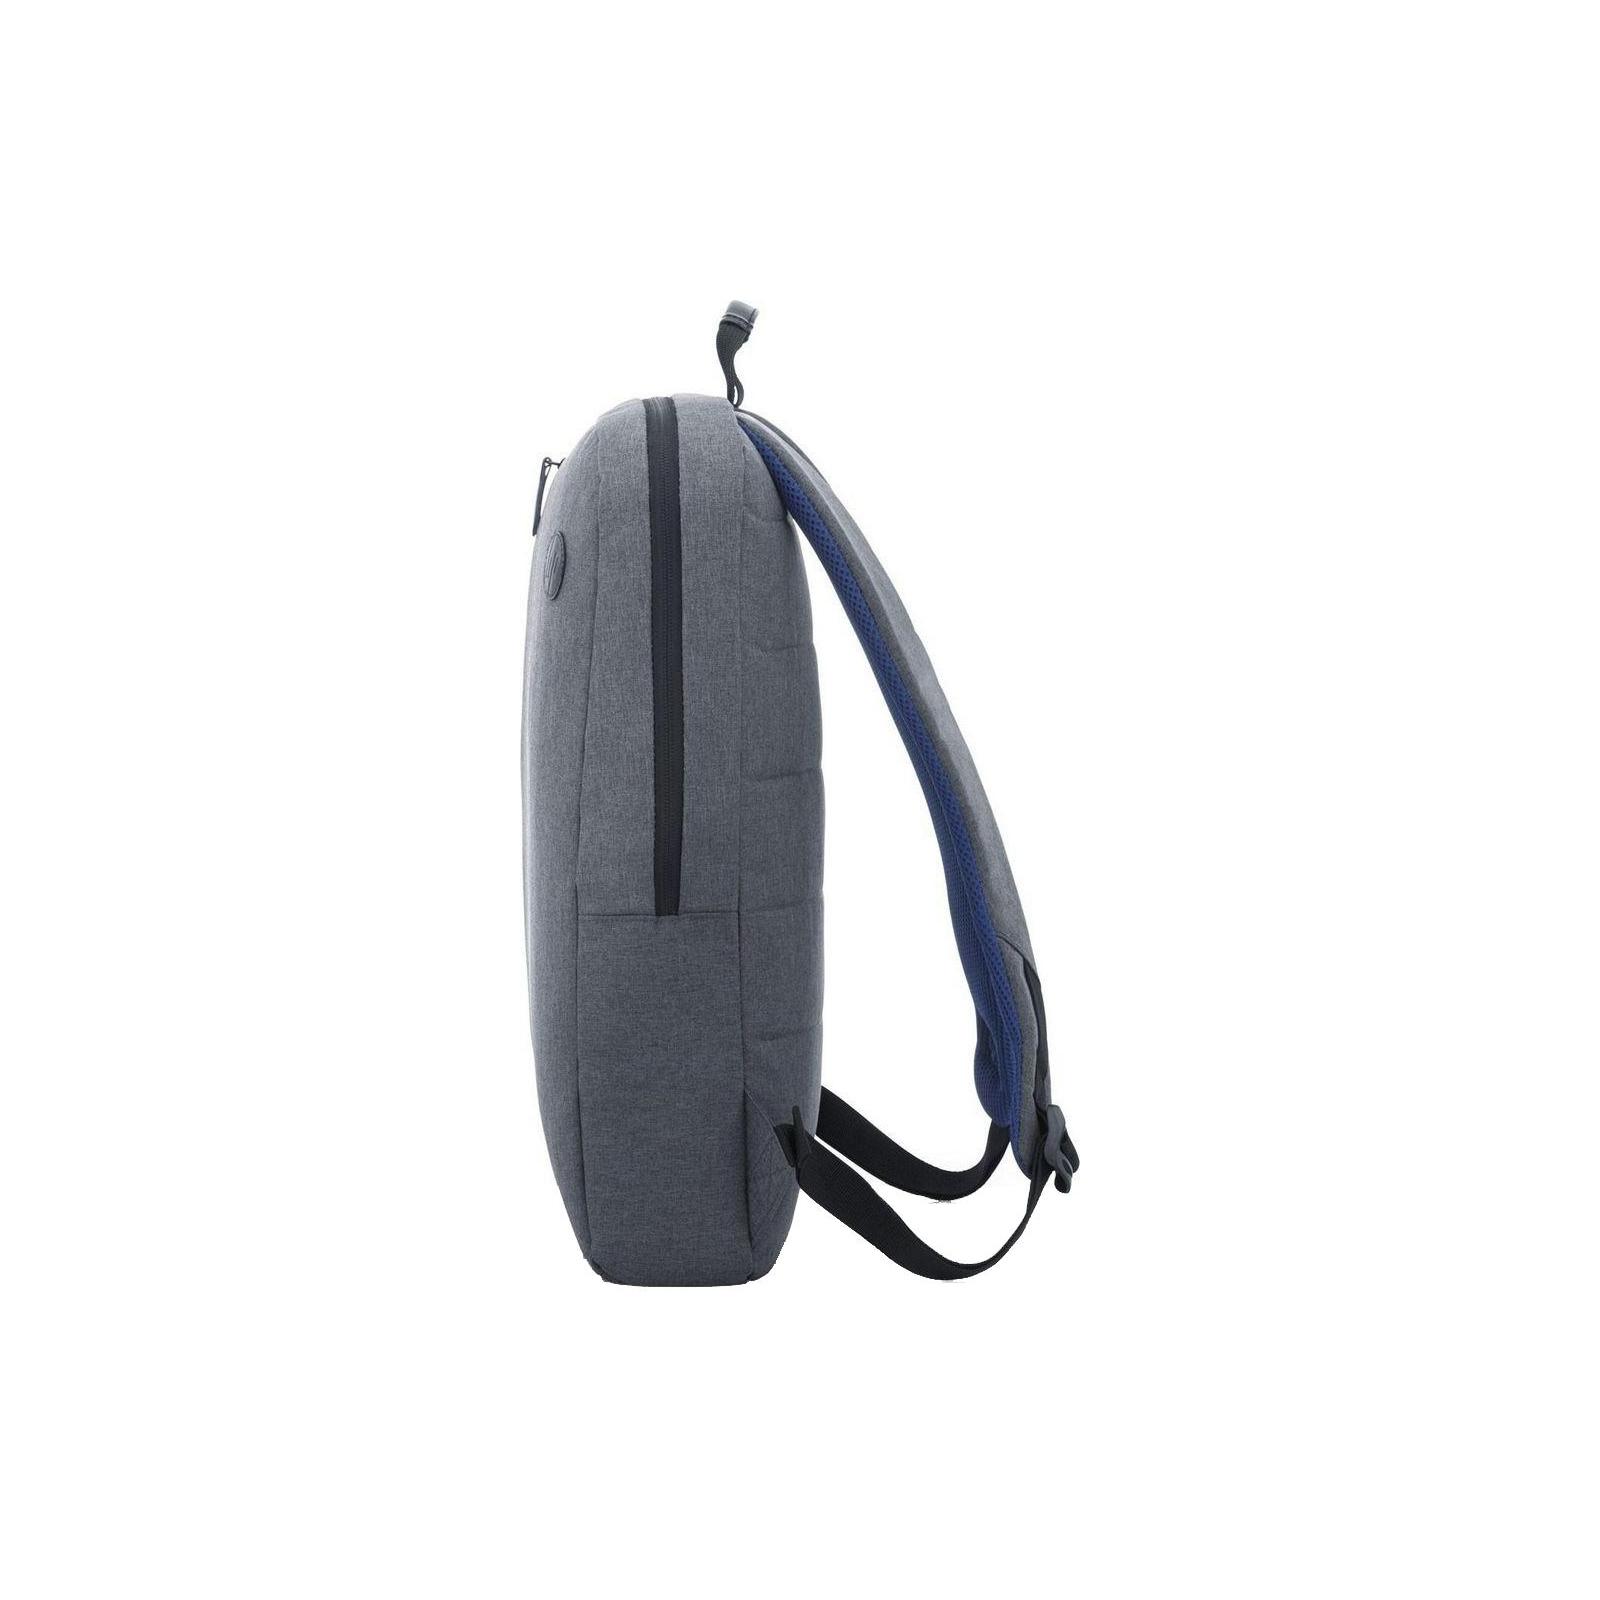 "Рюкзак для ноутбука HP 15.6"" Value Grey (K0B39AA) изображение 2"